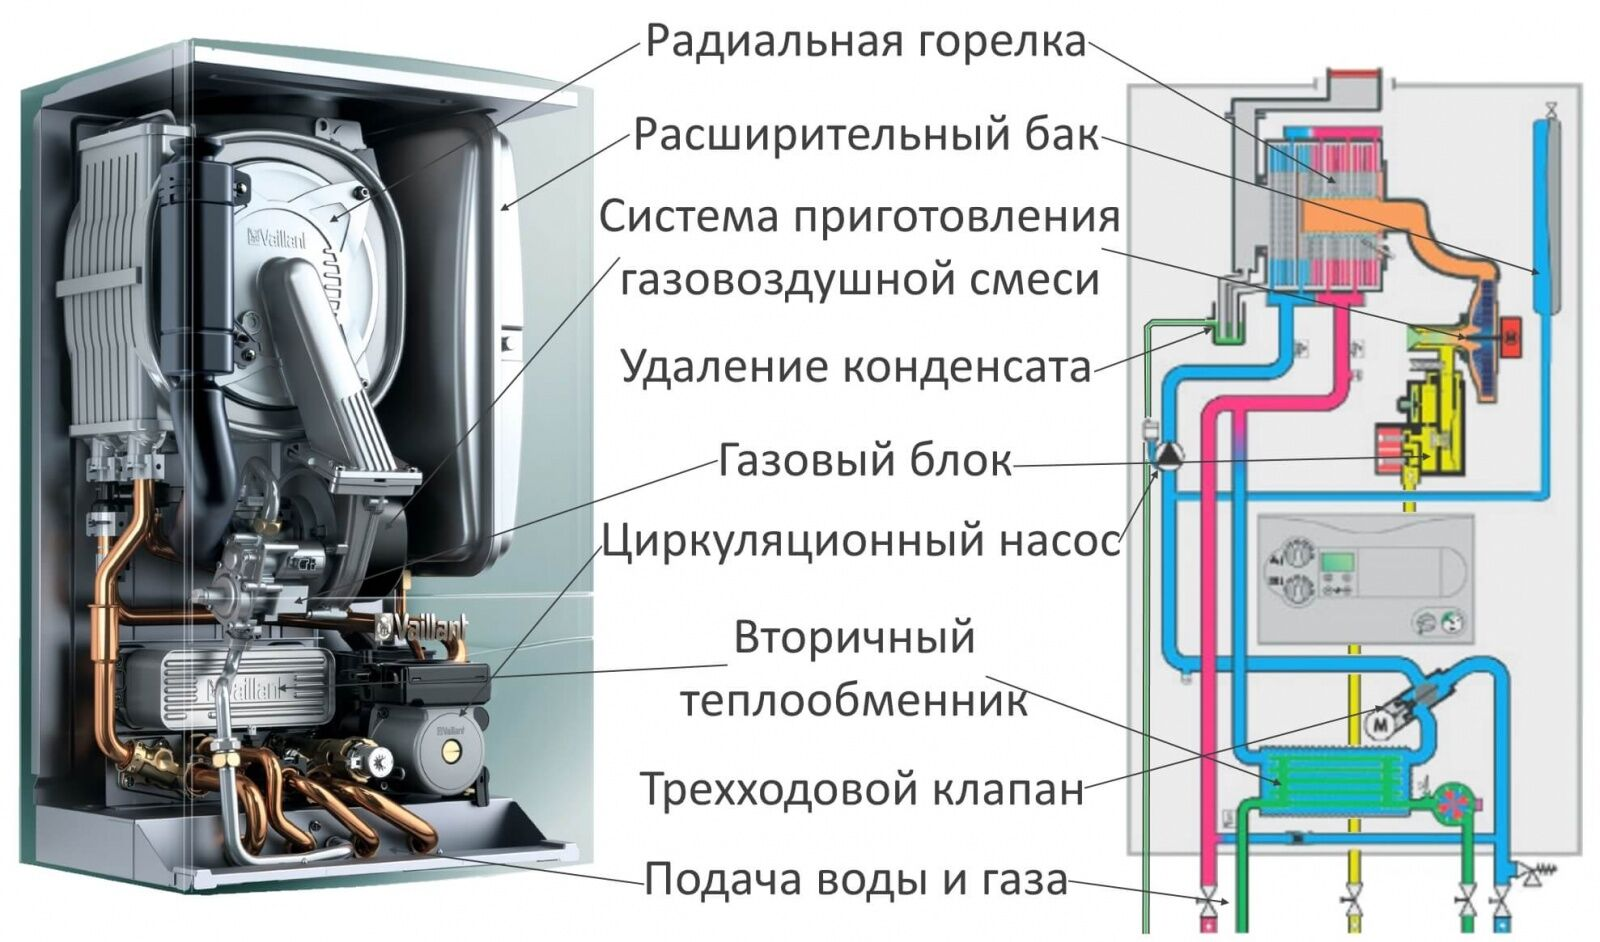 Павелецкий вокзал схема павелецкого вокзала